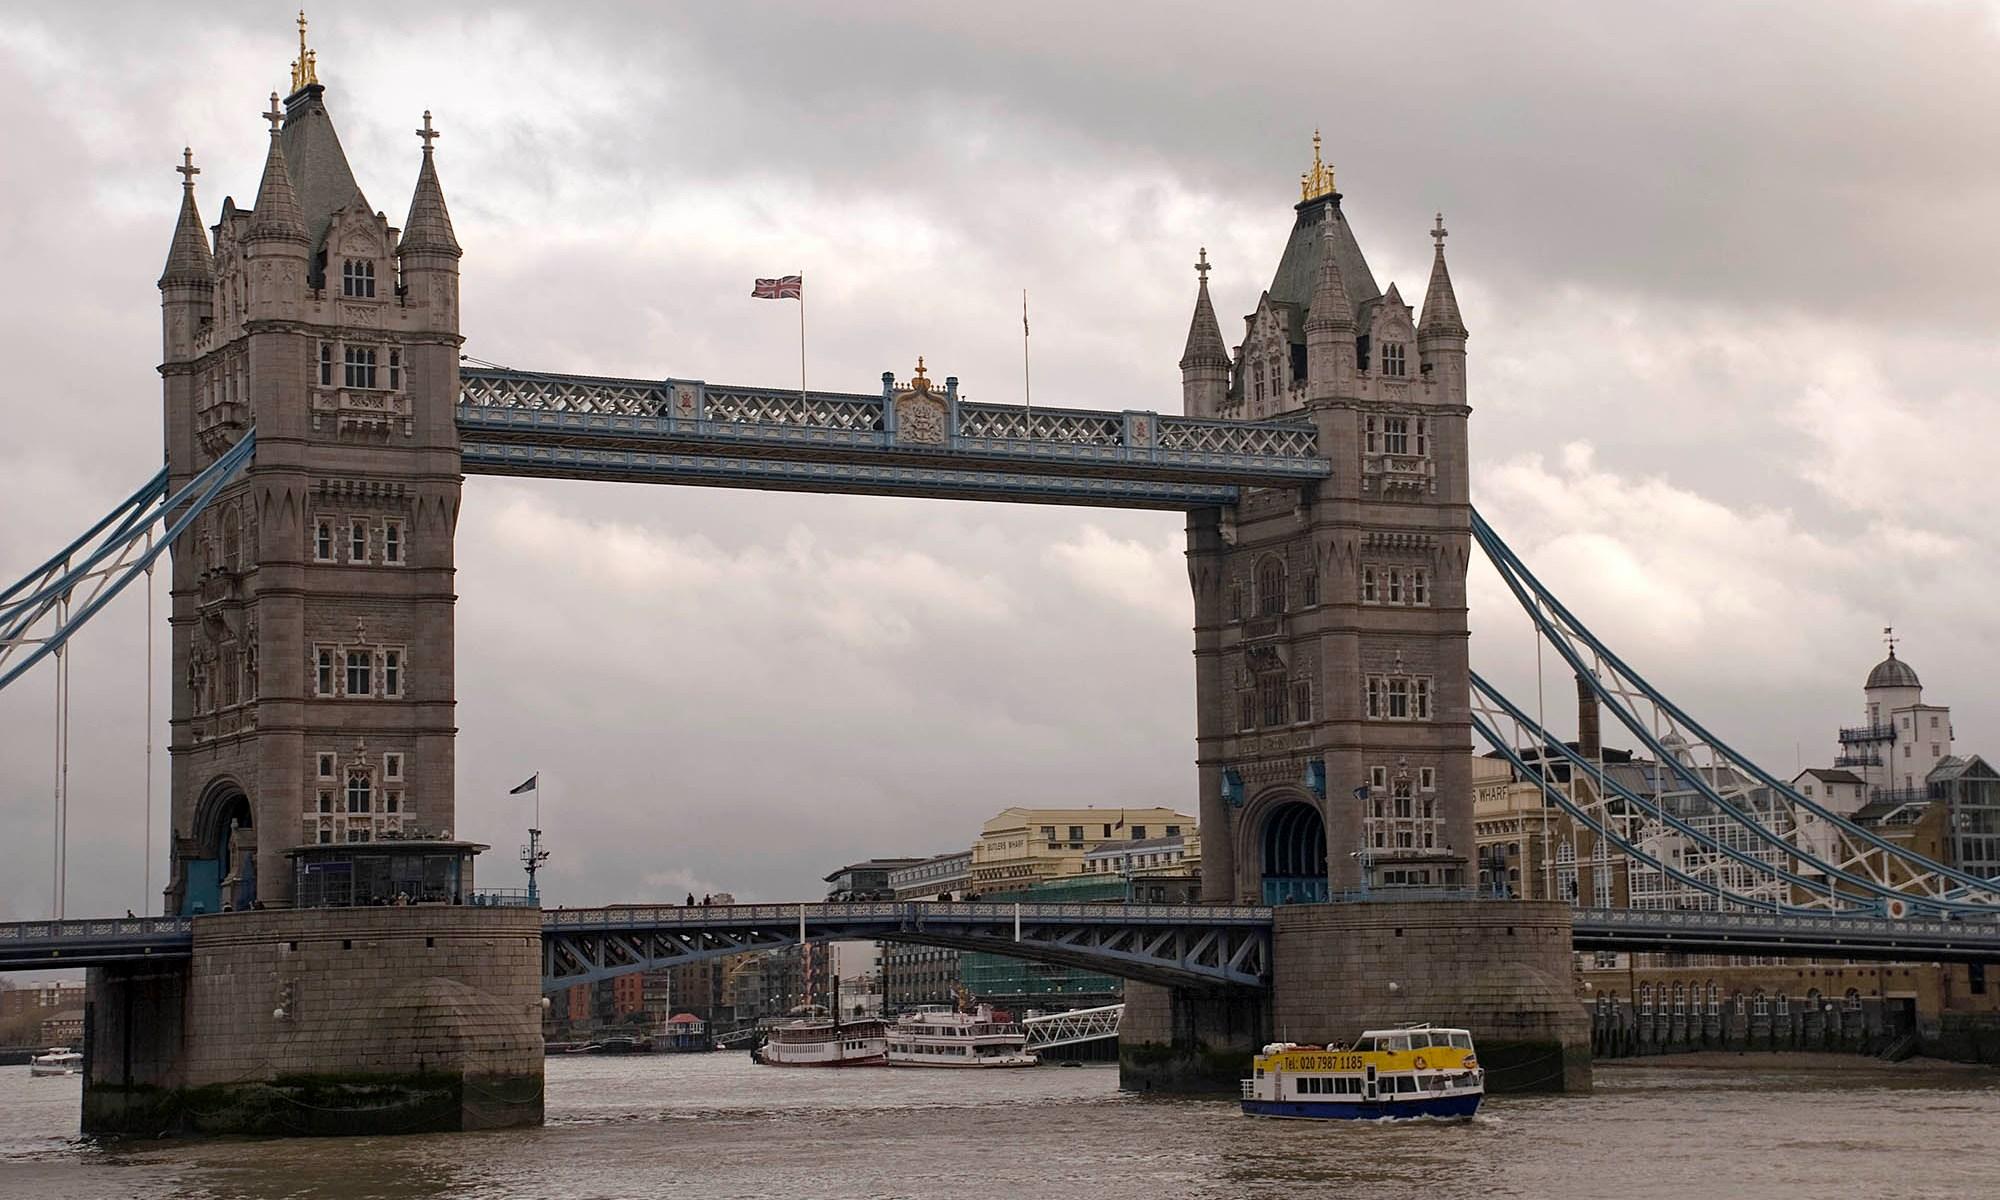 London's Tower Bridge on the River Thames